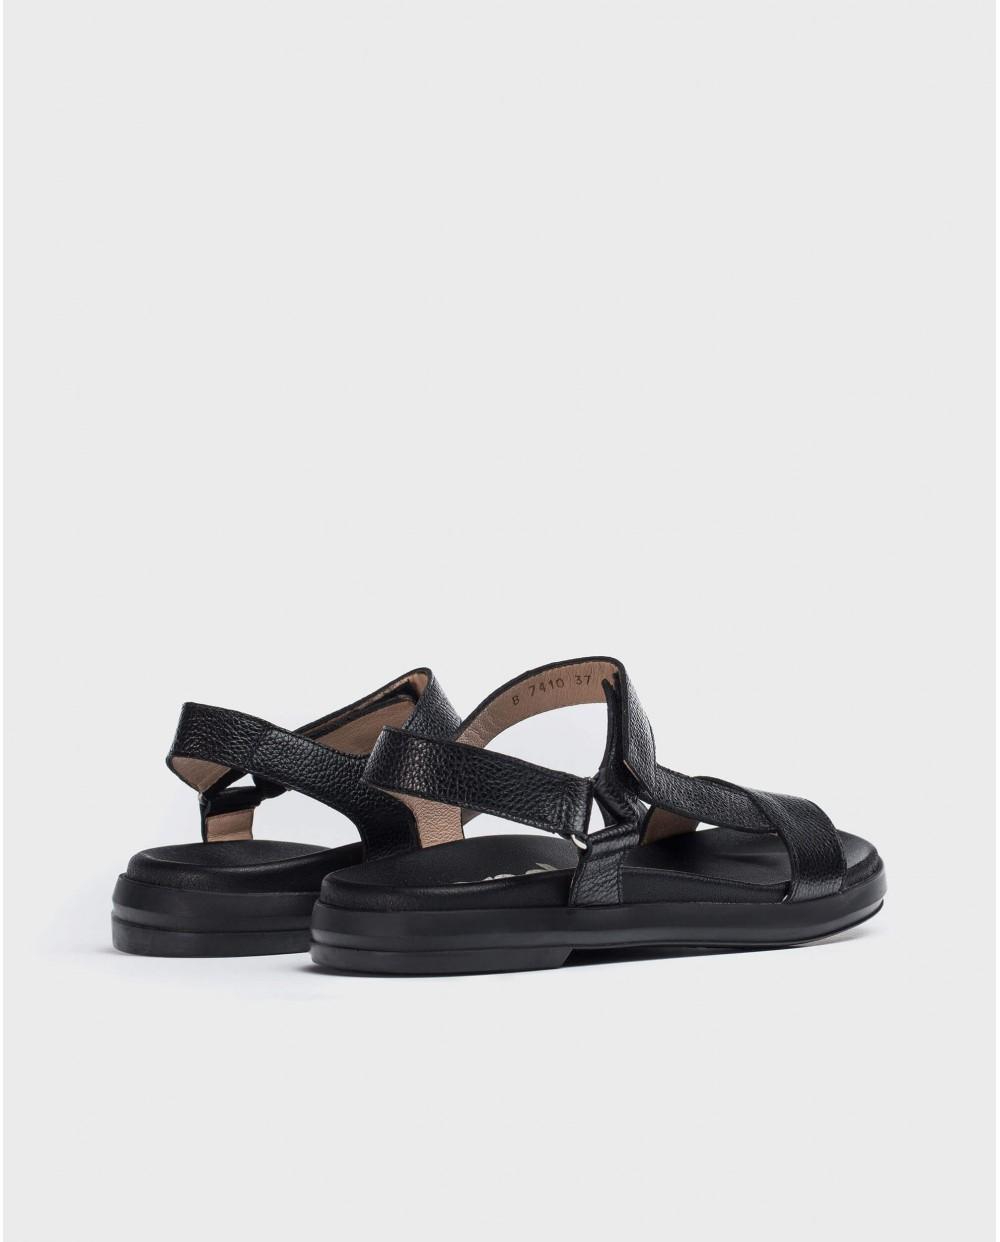 Wonders-Women-BIO adjustable sandal